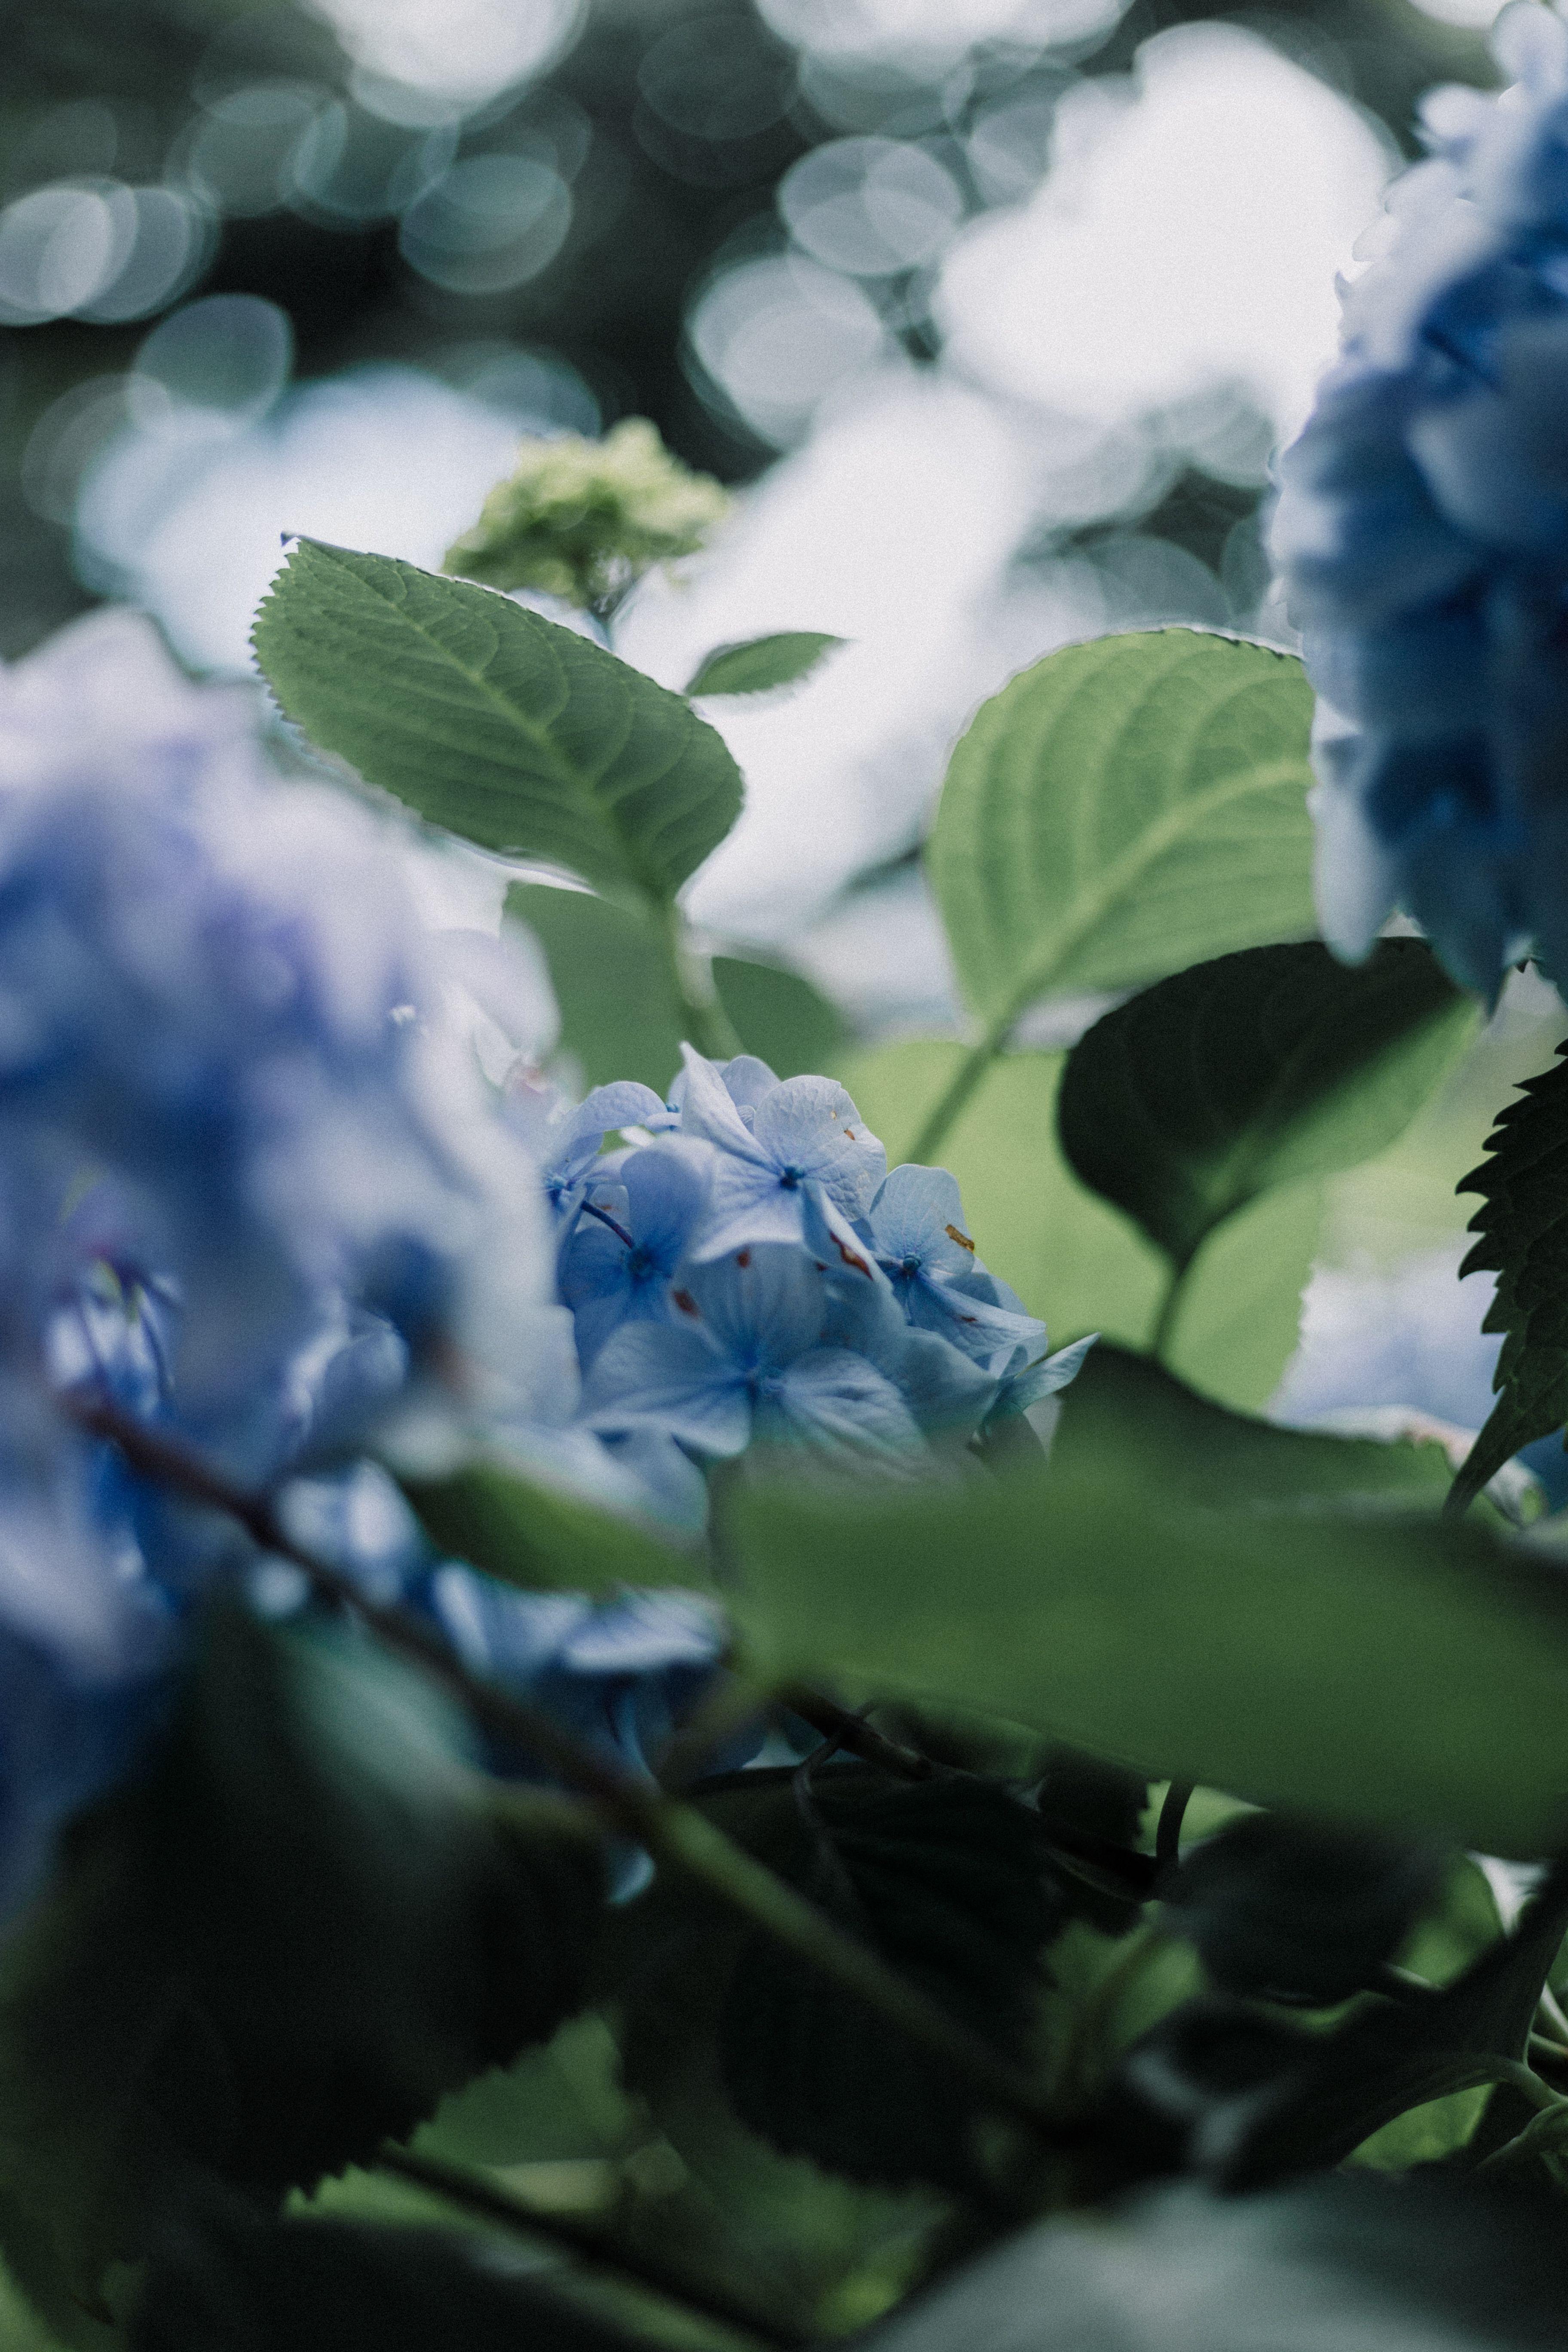 9 Shocking Flowers Pics Blue Hydrangea Flowers Flower Blossom Plant In 2020 Blue Hydrangea Flowers Medicinal Plants Flower Pictures